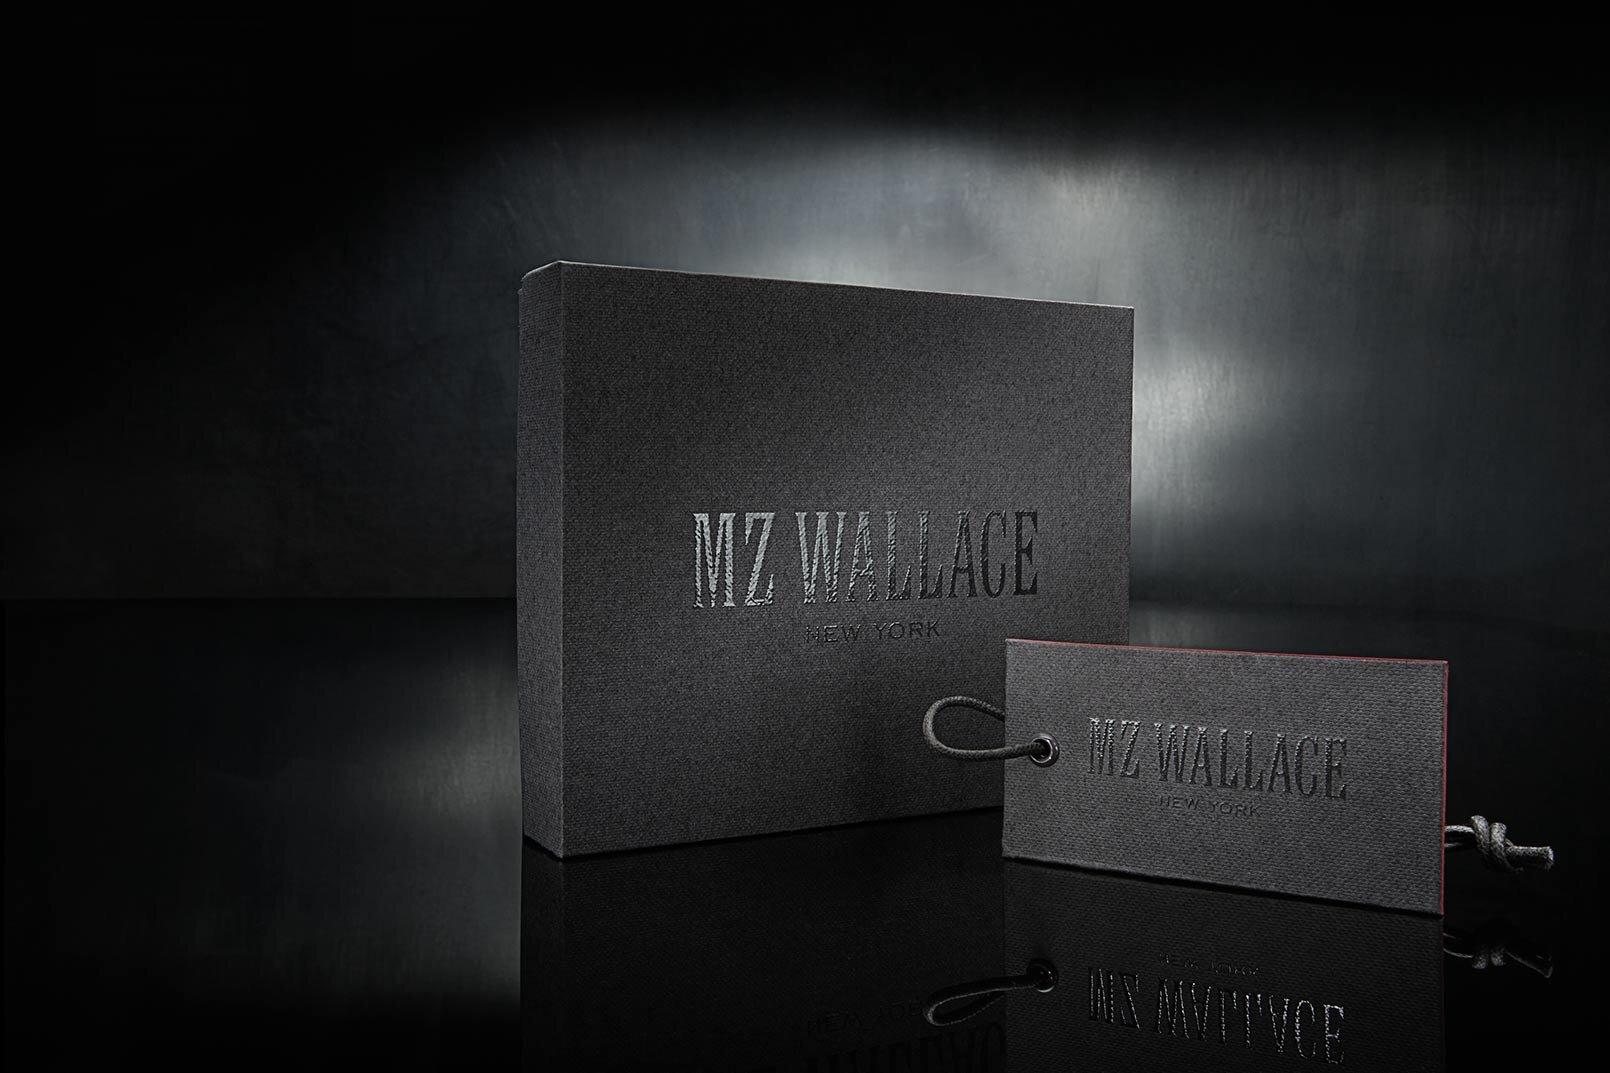 MZ-Wallace-Shopping-Bag-Design-Packaging-Company-1.JPG